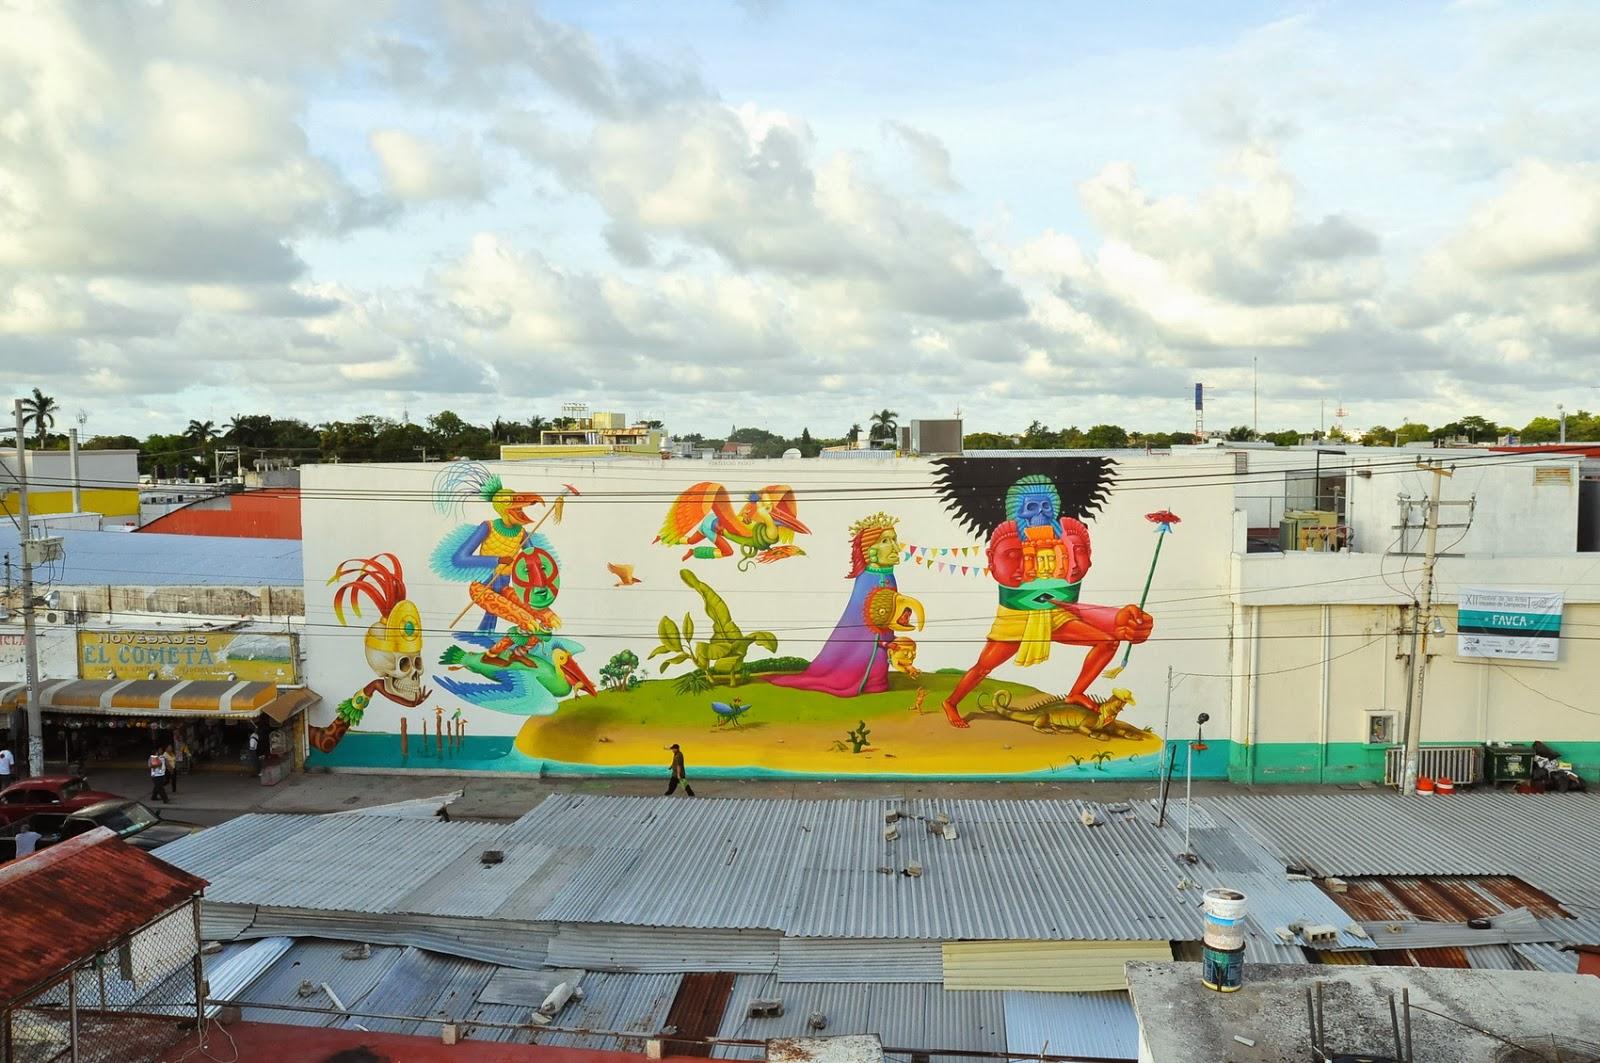 interesni-kazki-new-mural-campeche-mexico-01